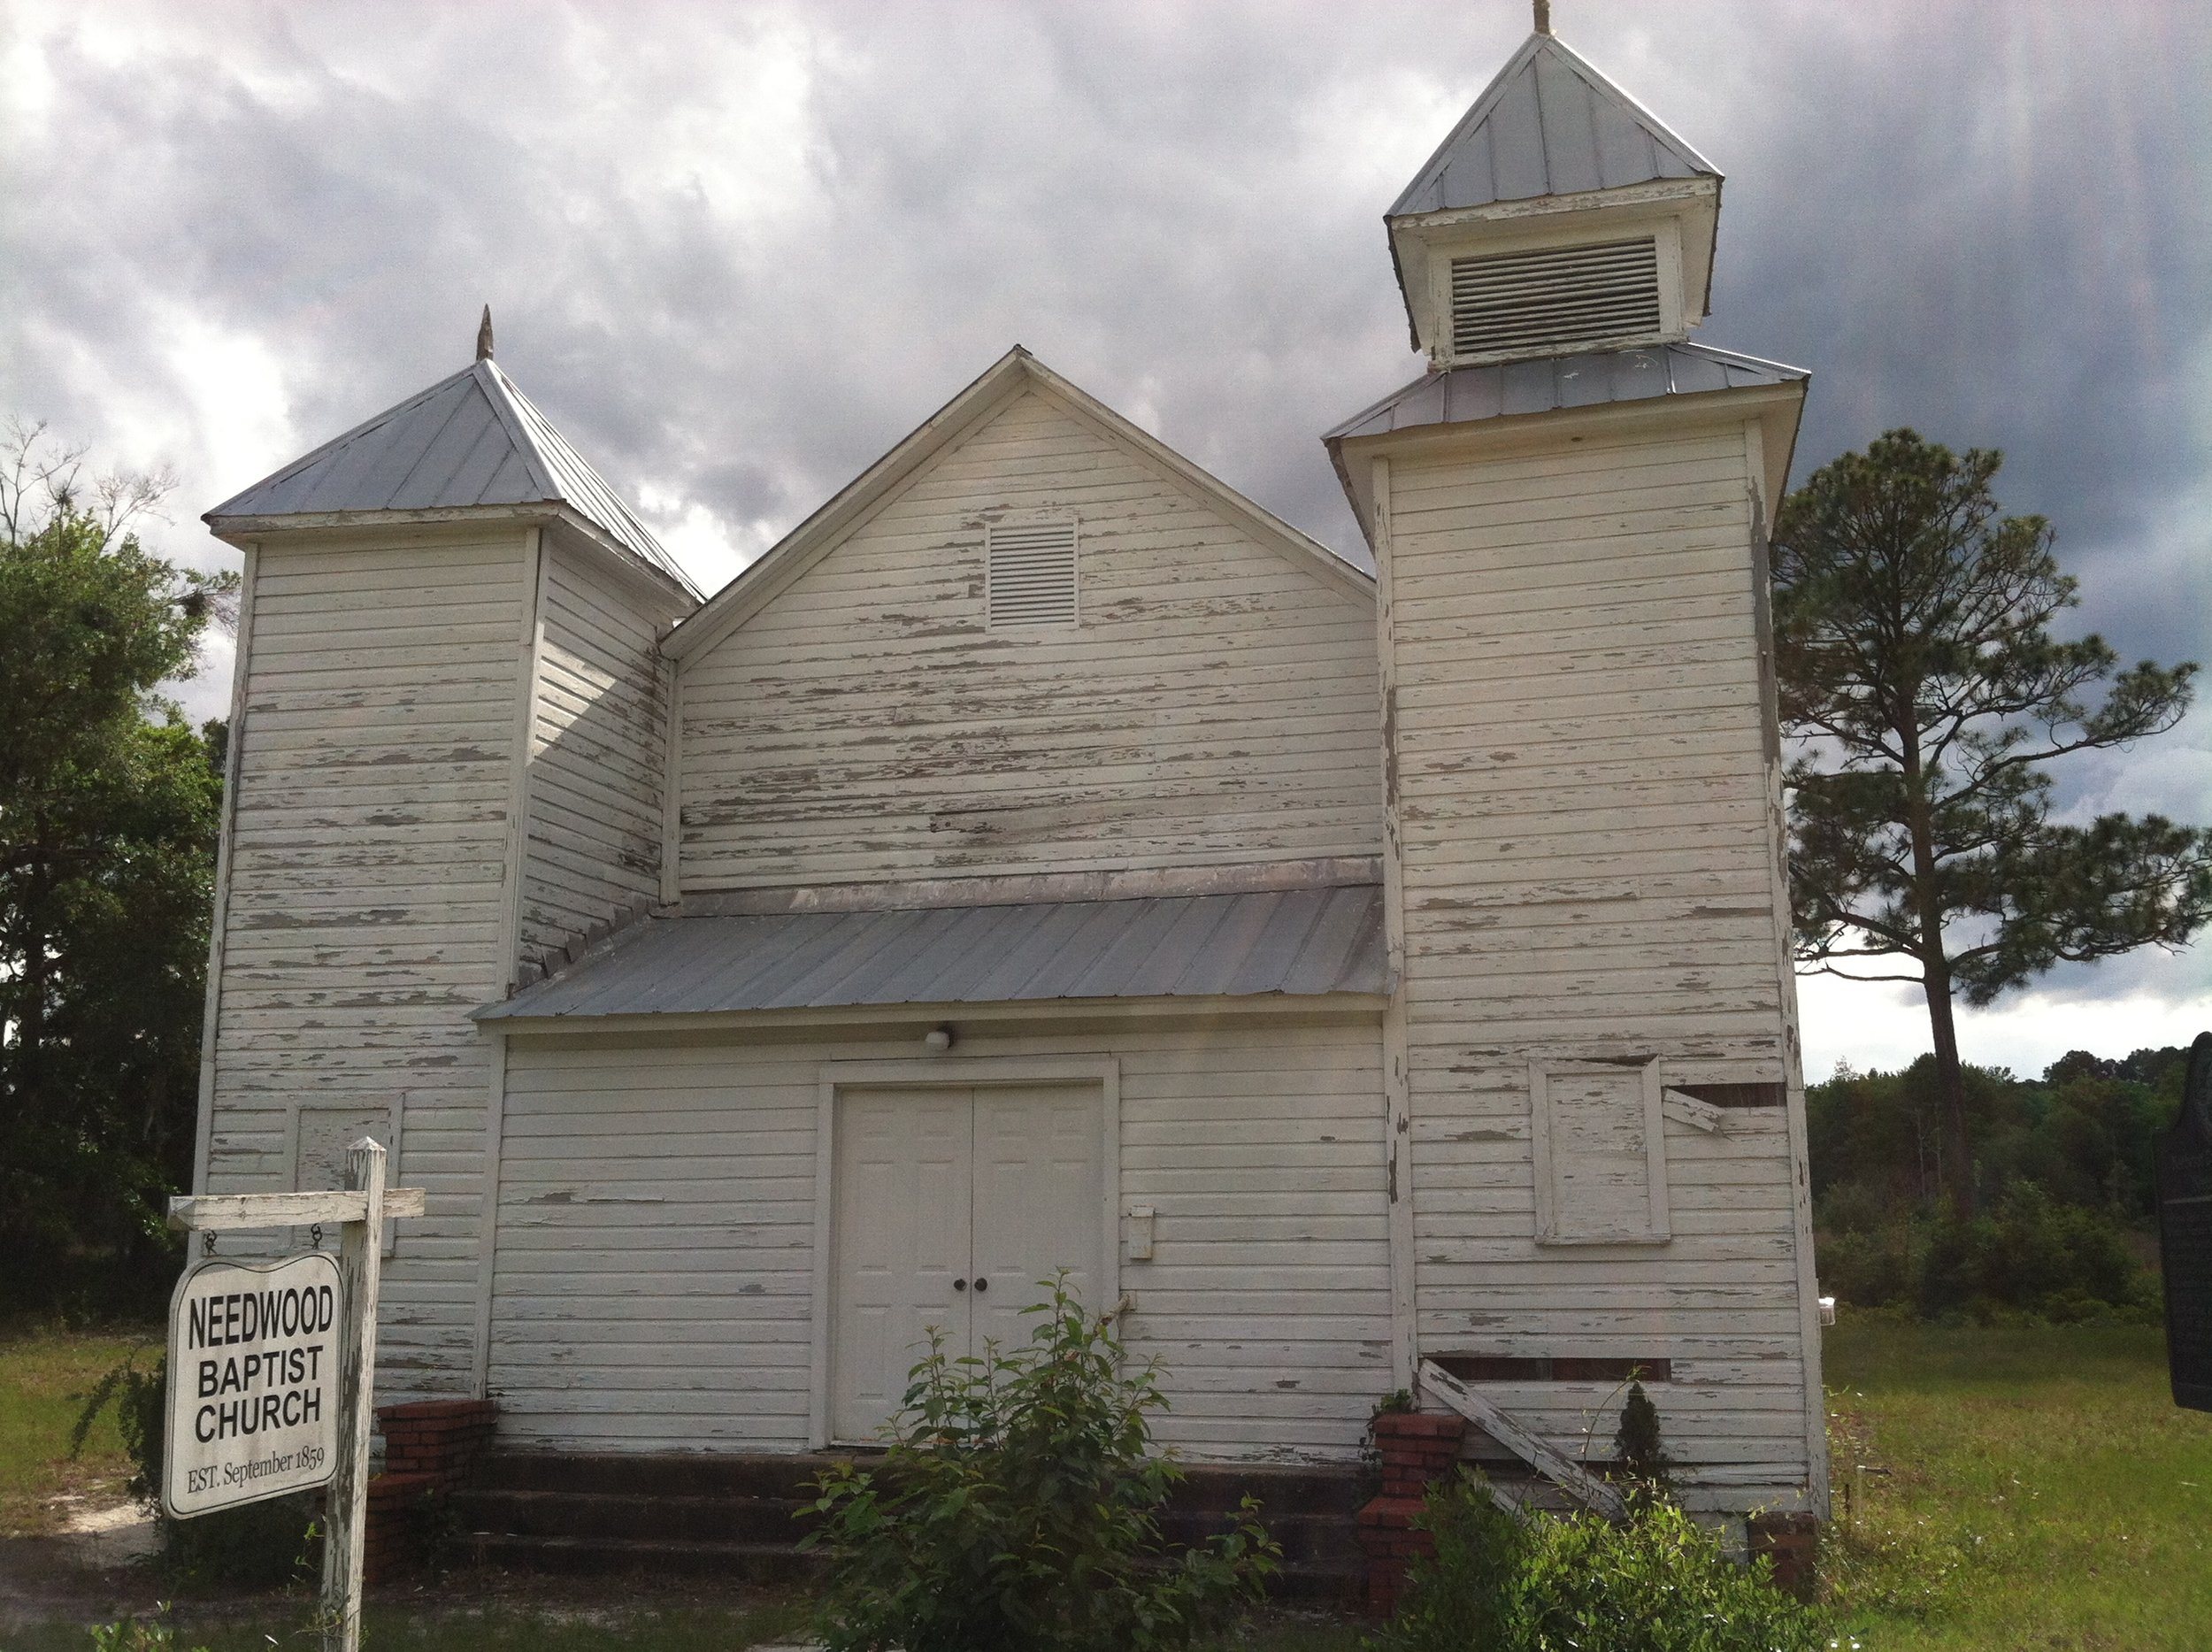 Needwood Baptist Church